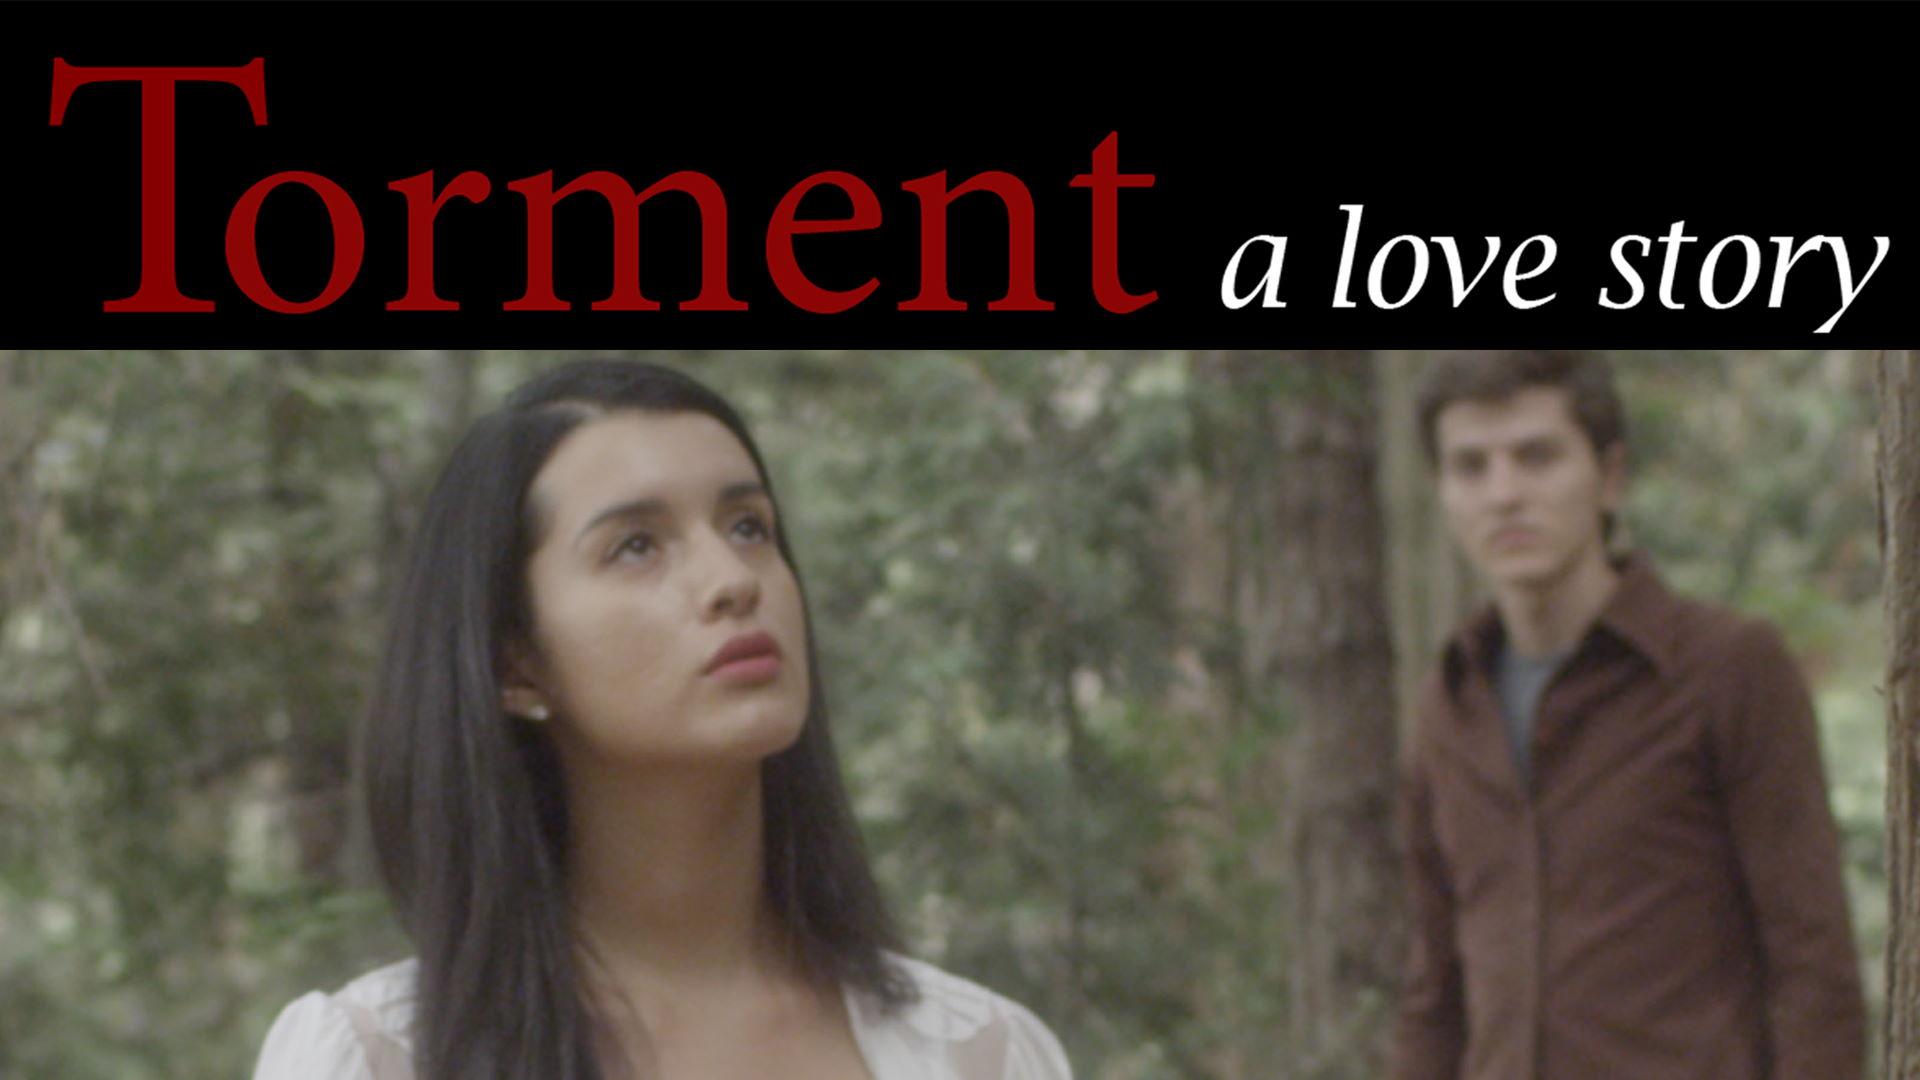 Torment A Love Story